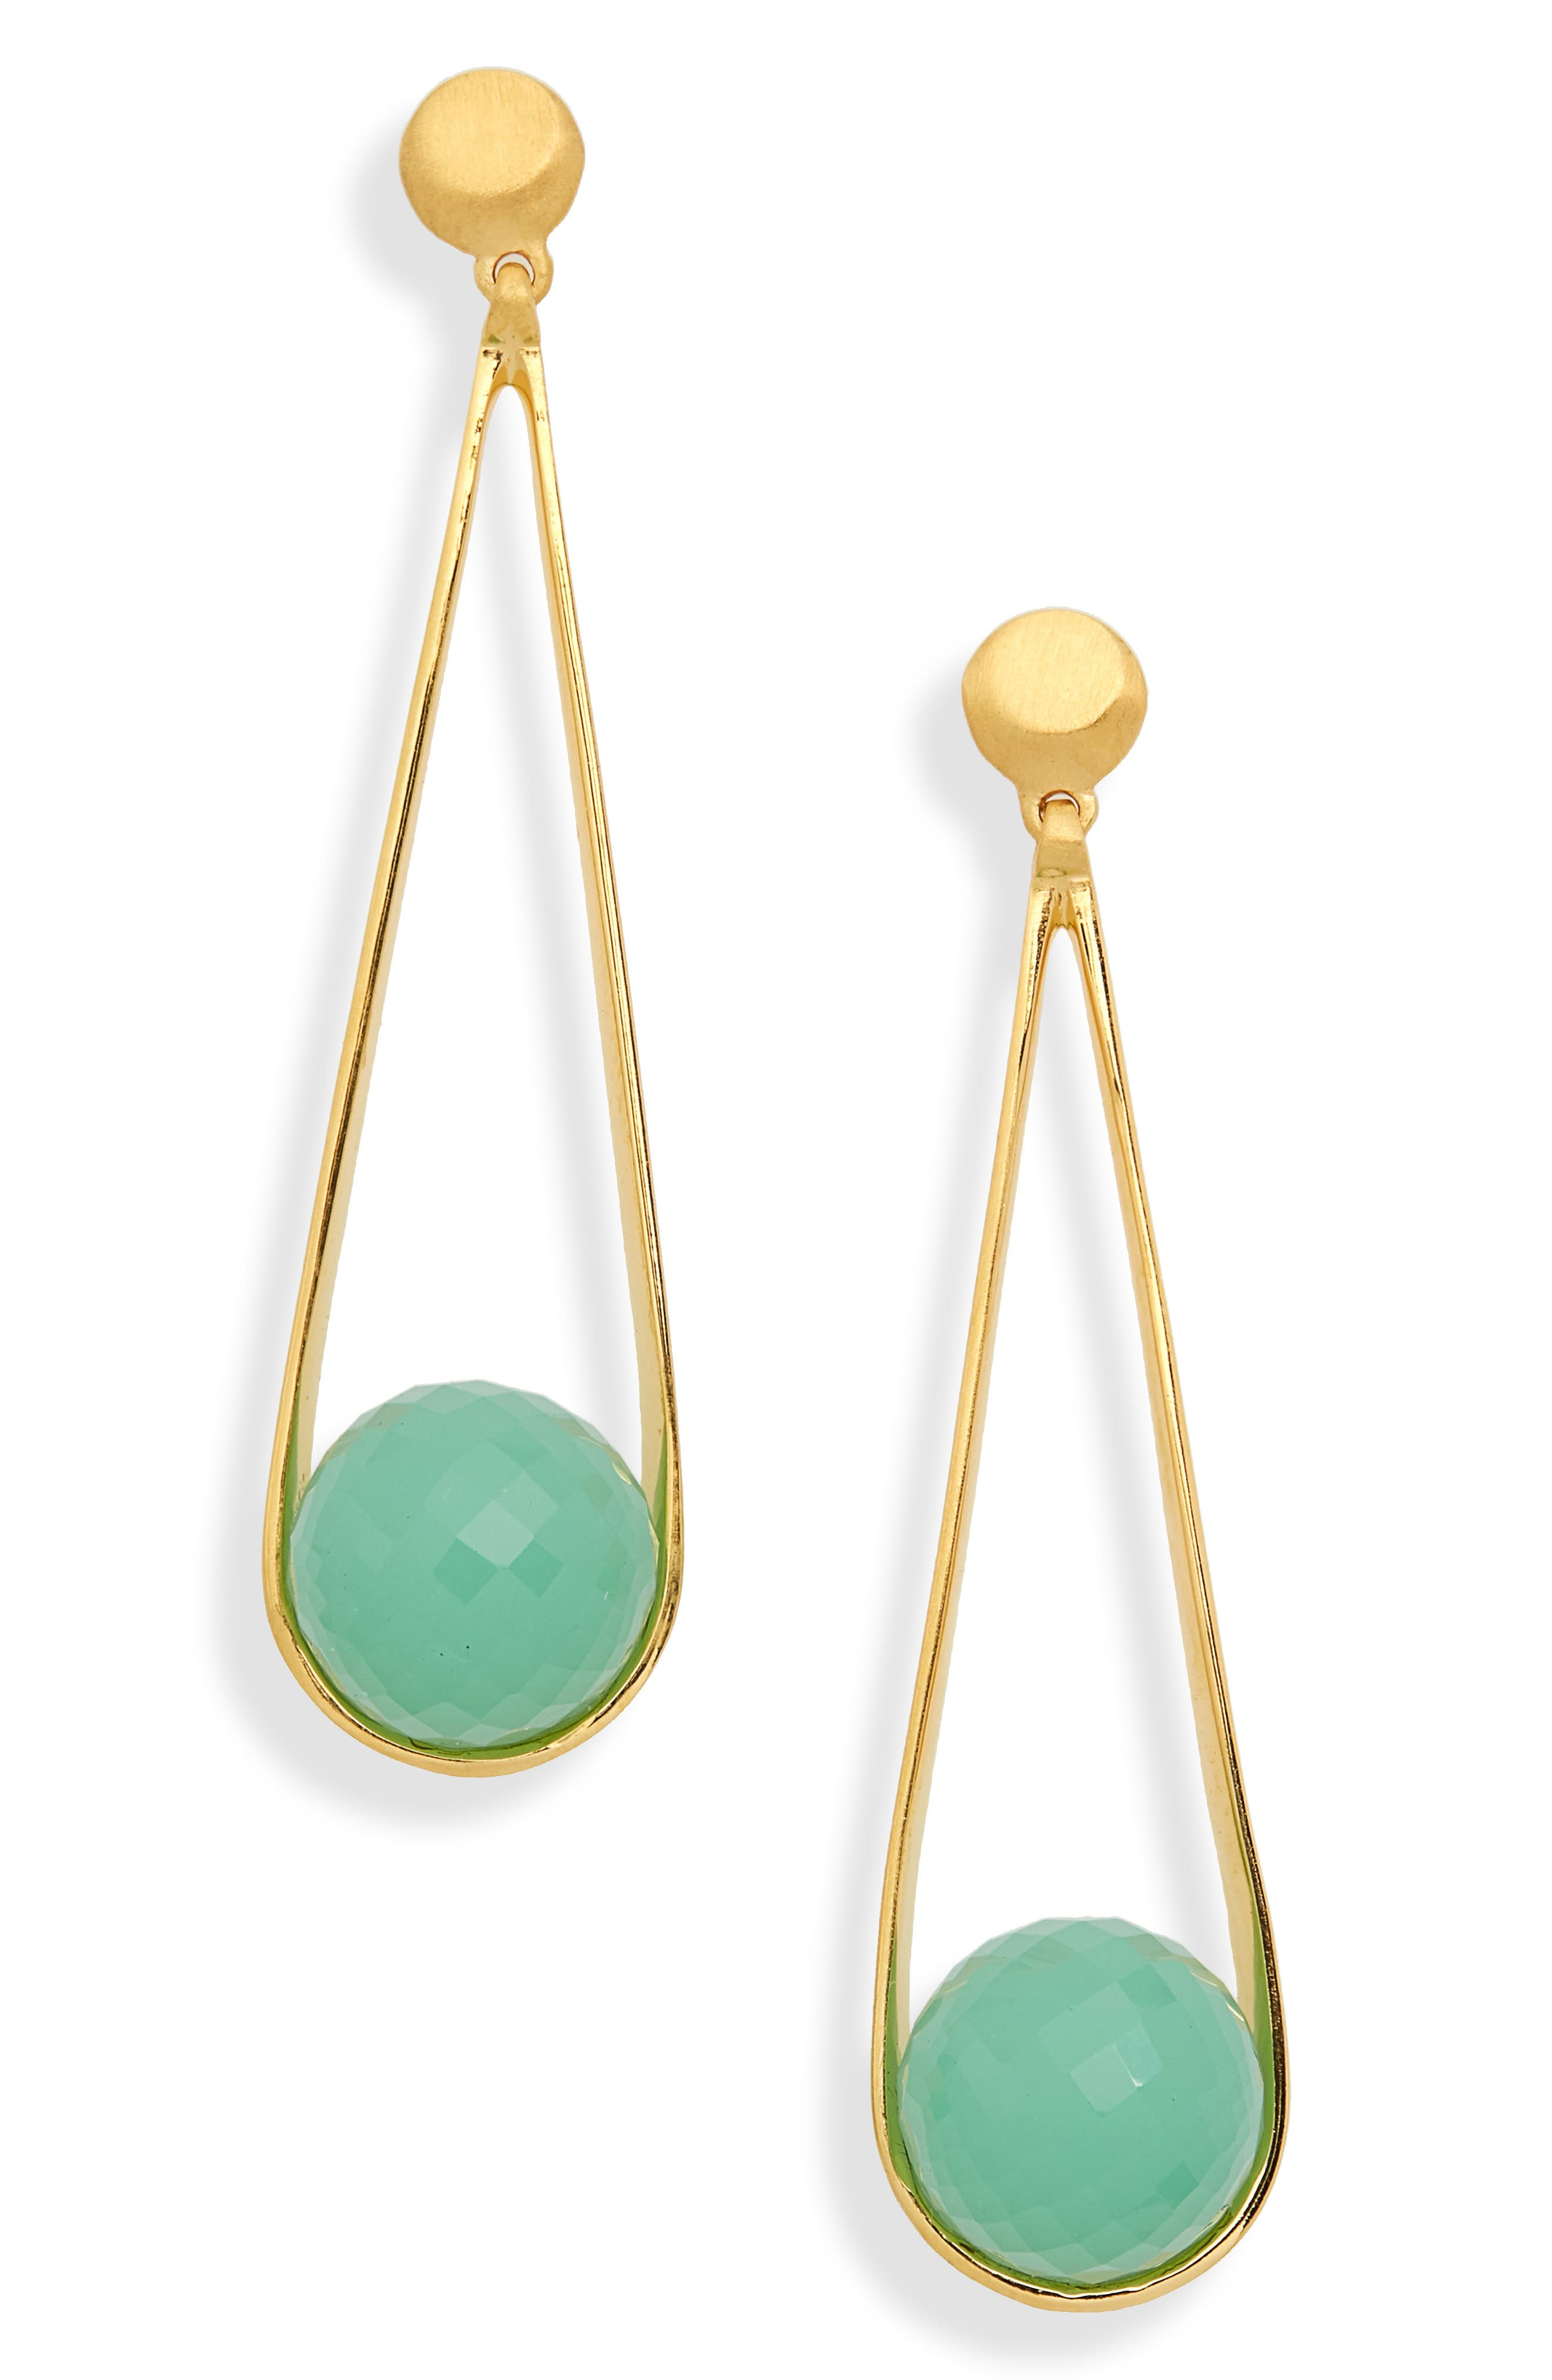 Ipanema Earrings,                             Main thumbnail 1, color,                             Ocean Blue Chalcedony/ Gold